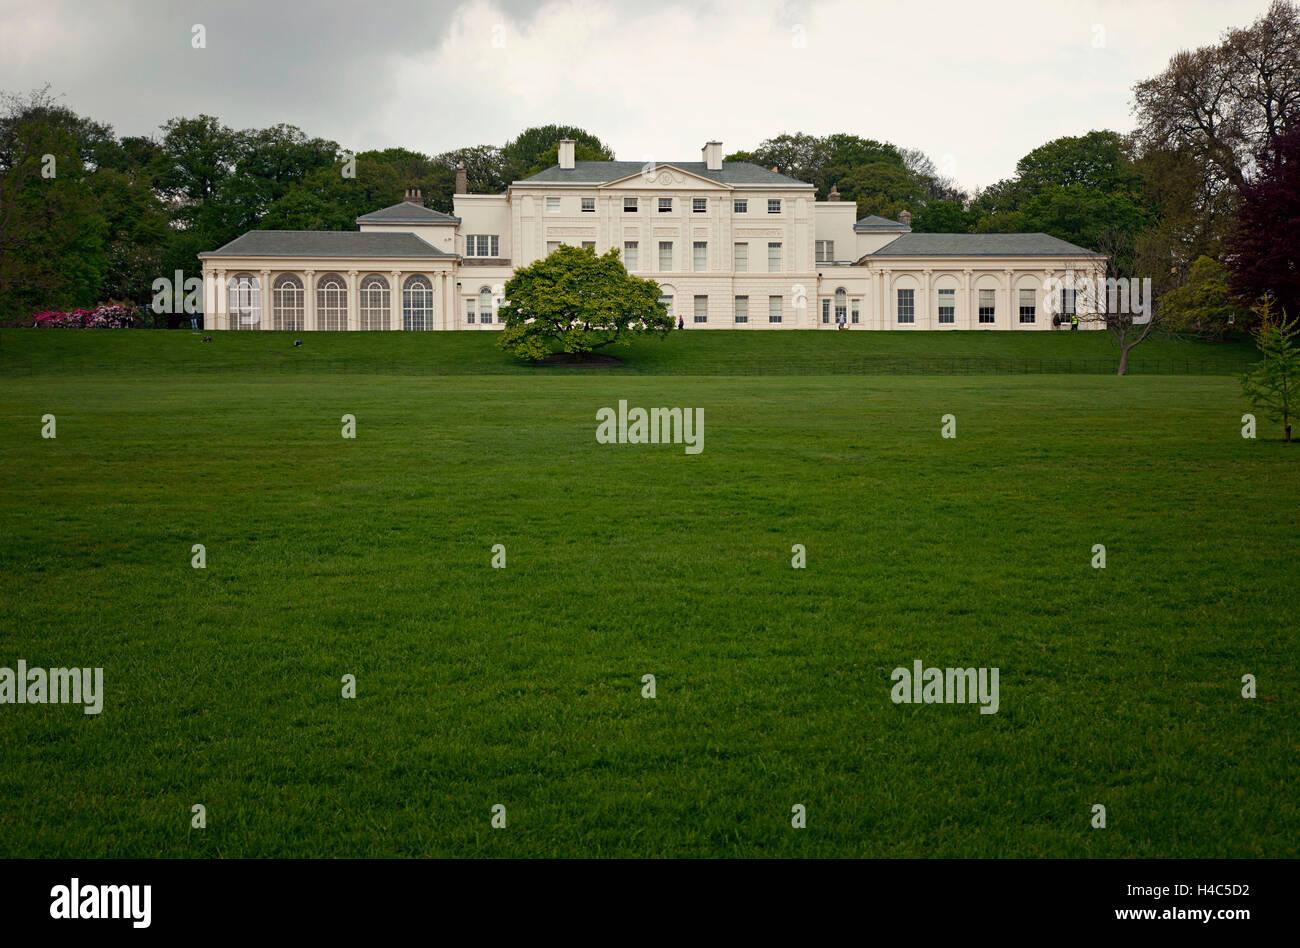 Great Britain, London, Hampstead Heath, architecture, house, grass, park - Stock Image